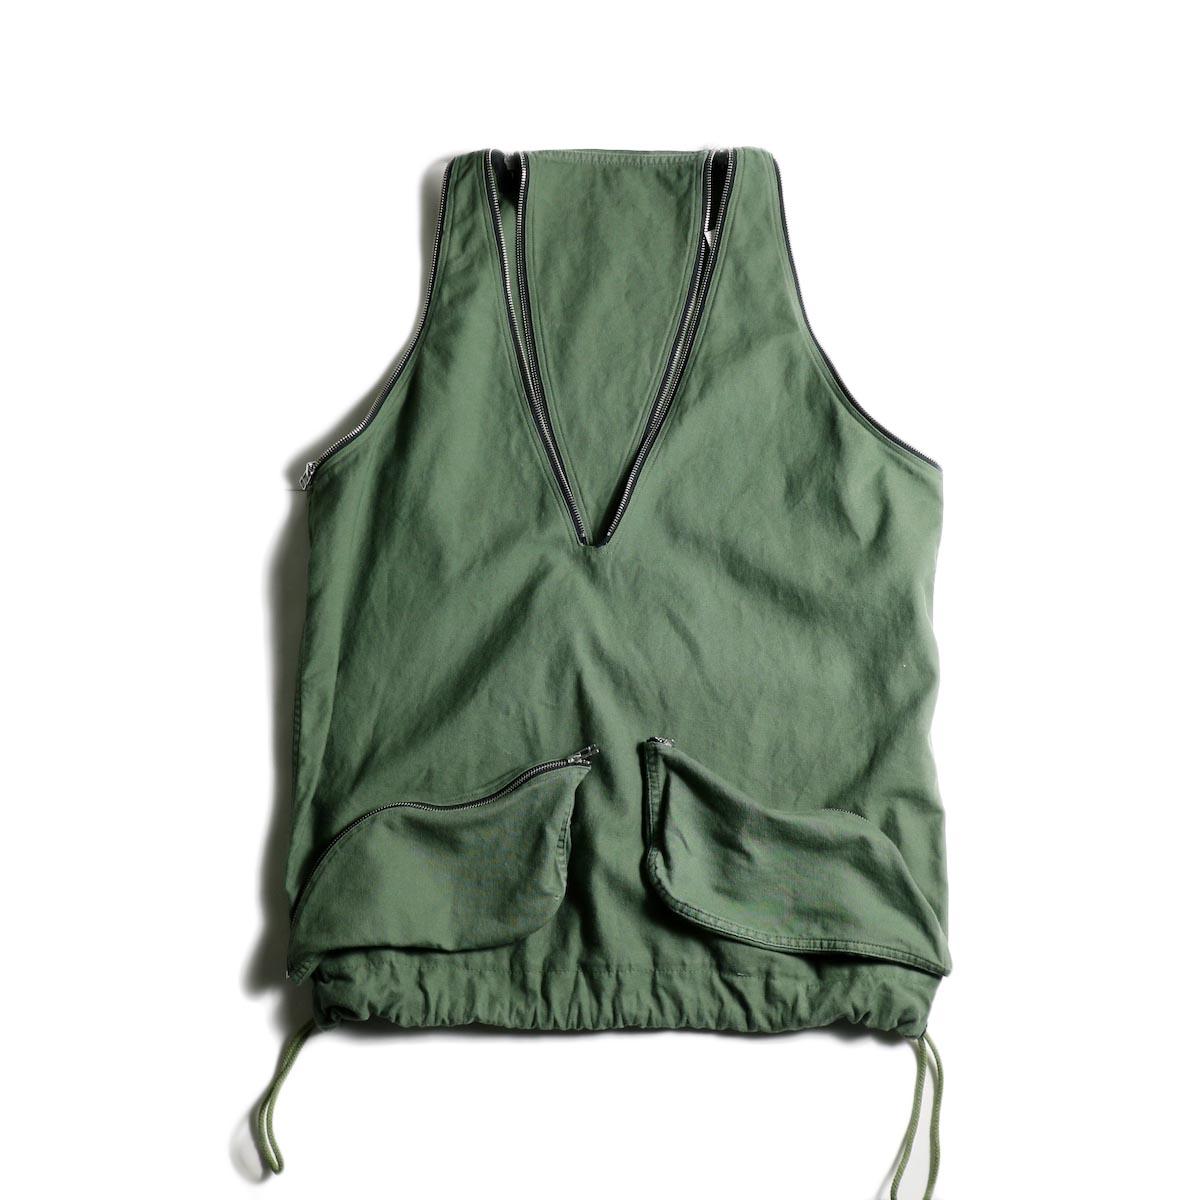 OLD PARK / LAUNDRY VEST BAG -Military